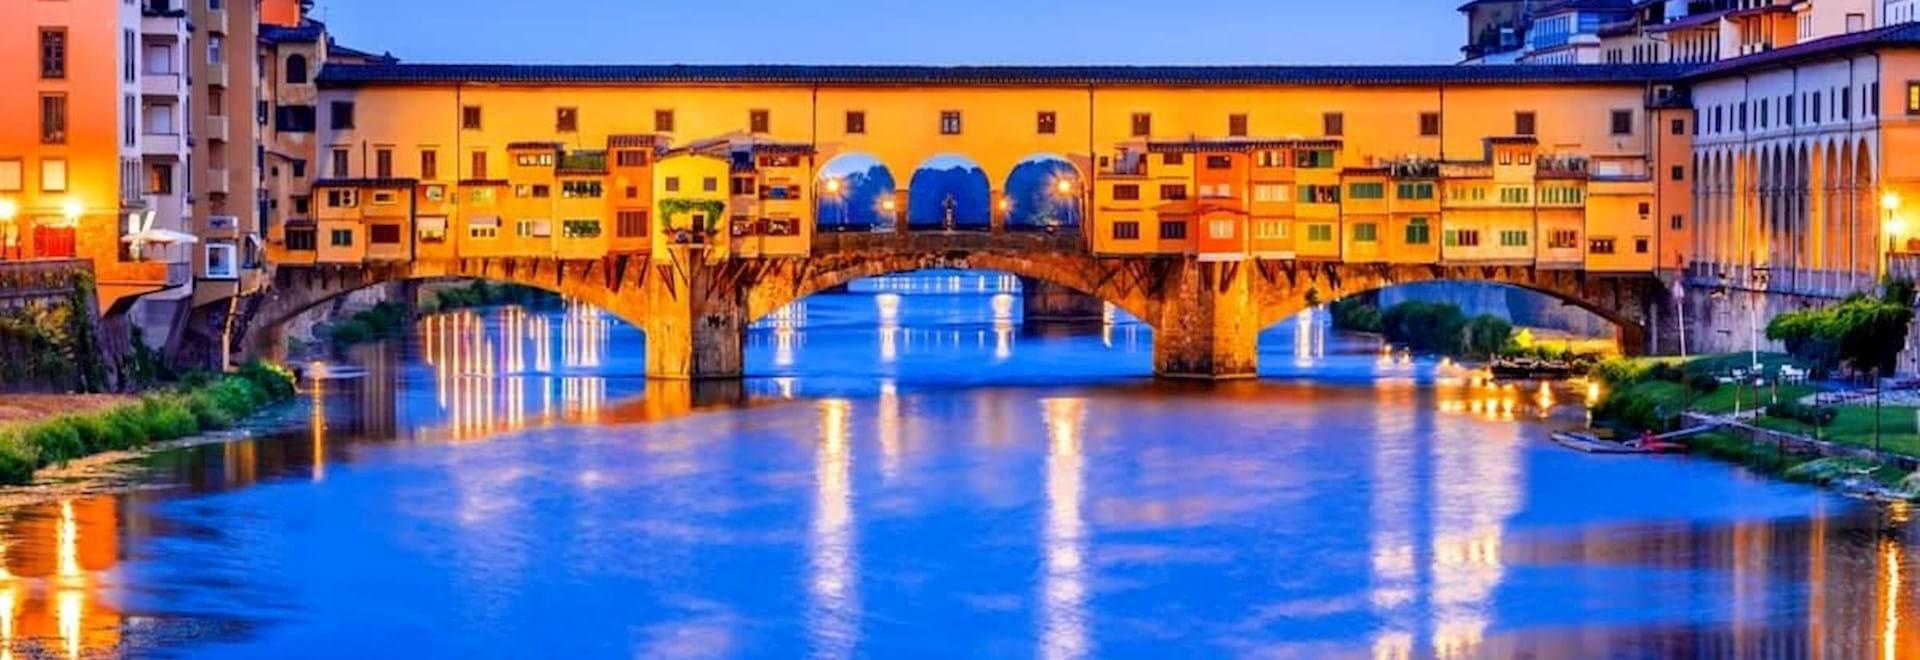 Ponte Vecchio Night Florence